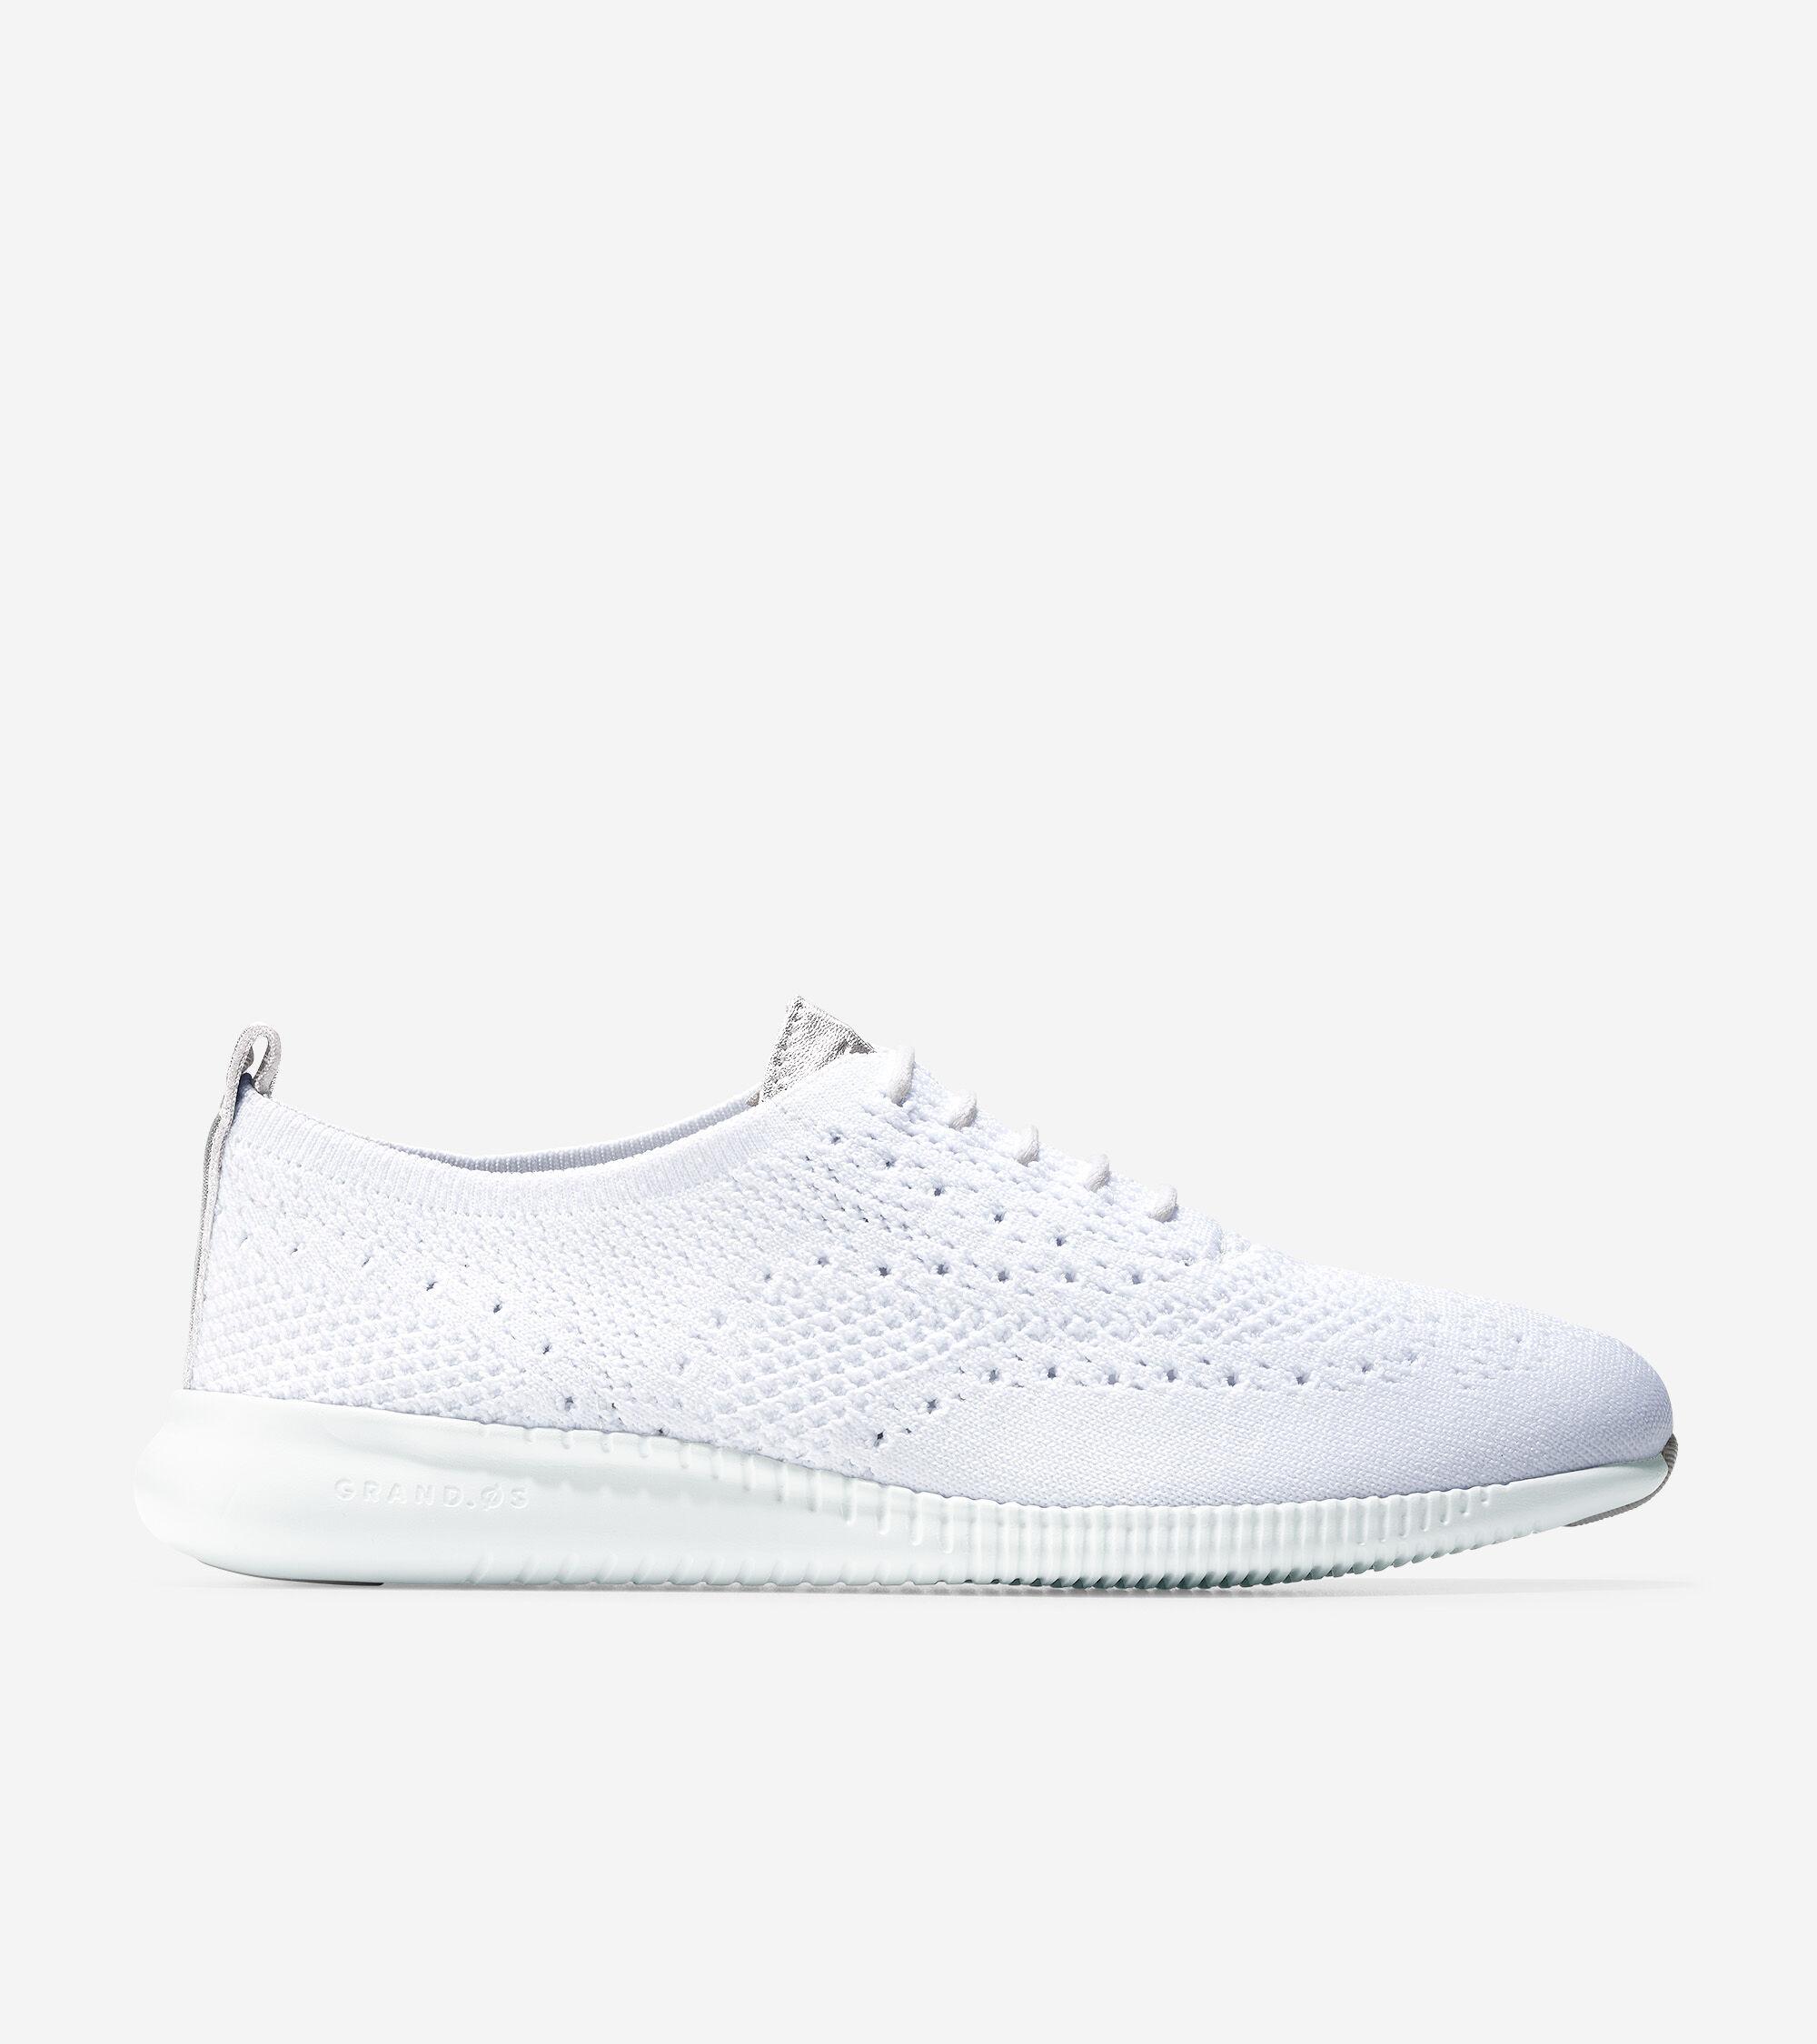 Cole Haan Women's 2.ZEROGRAND Stitchlite Oxford Shoes